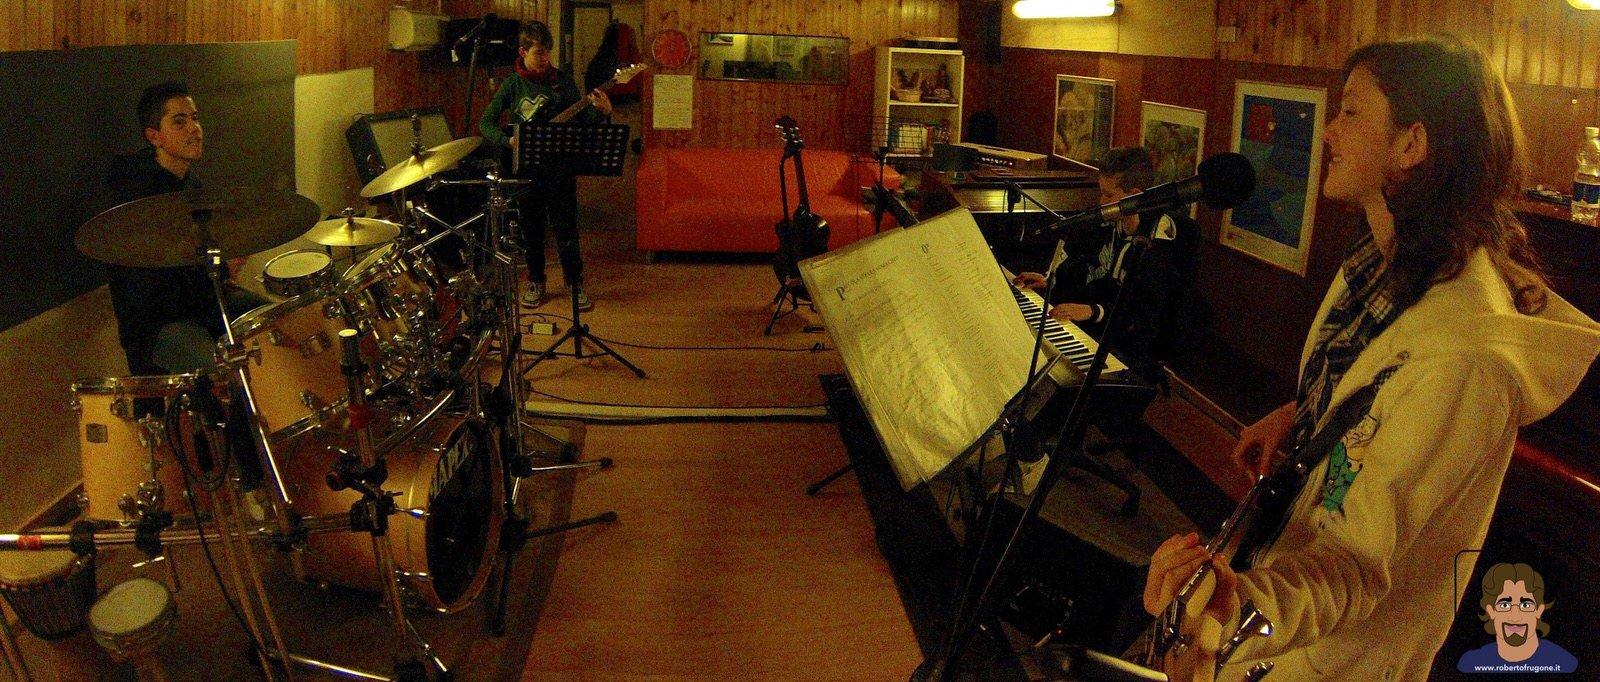 Totem Studio Sala Prove Musicali Casarza Ligure Laboratorio Musica d'Insieme 01